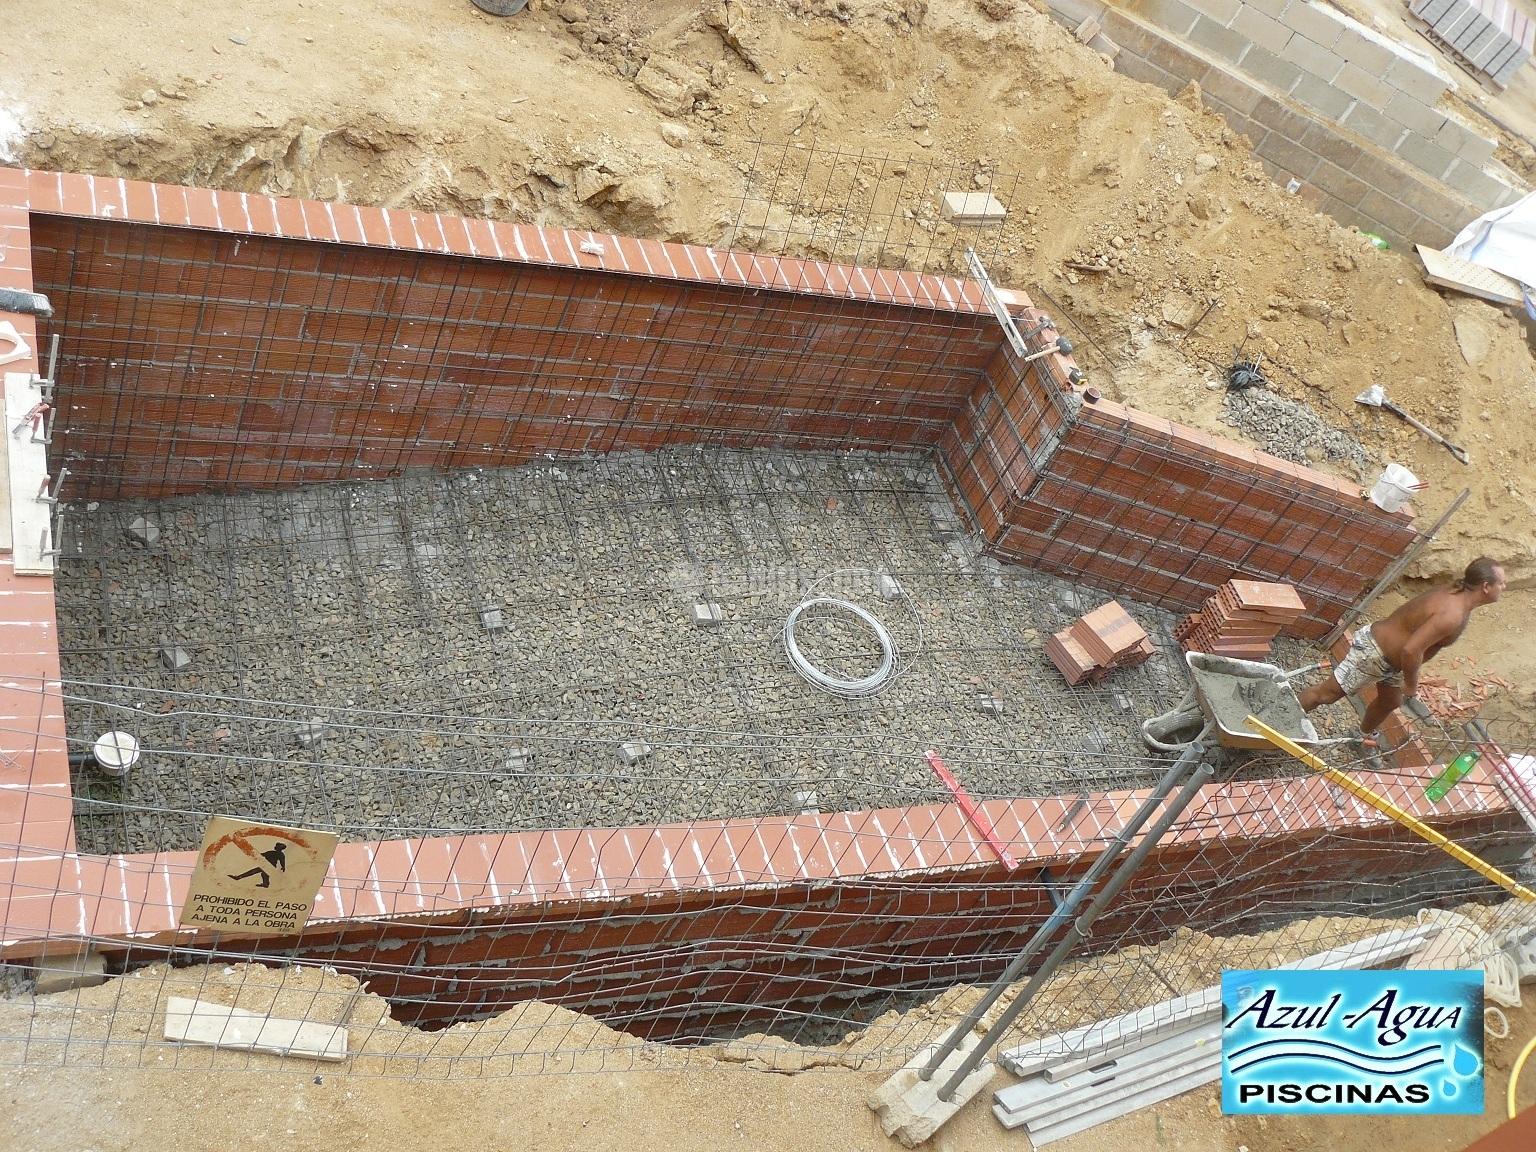 Construcci n piscina en obra gunitada en gerona ideas for Construccion de piscinas de obra